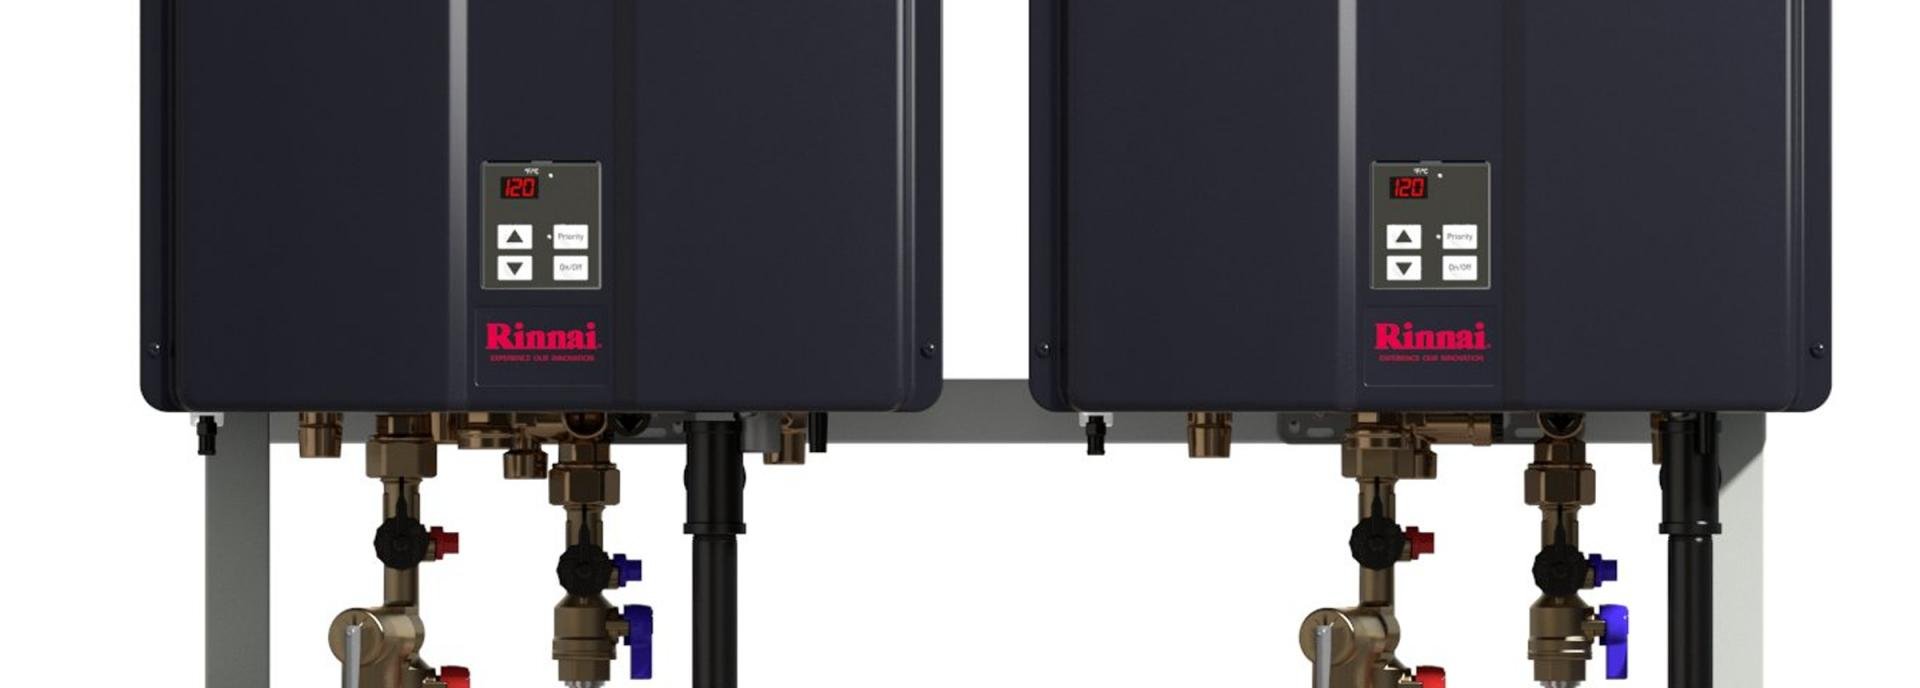 medium resolution of cu199 models rinnai america cu199 models rinnai boilers wiring diagram